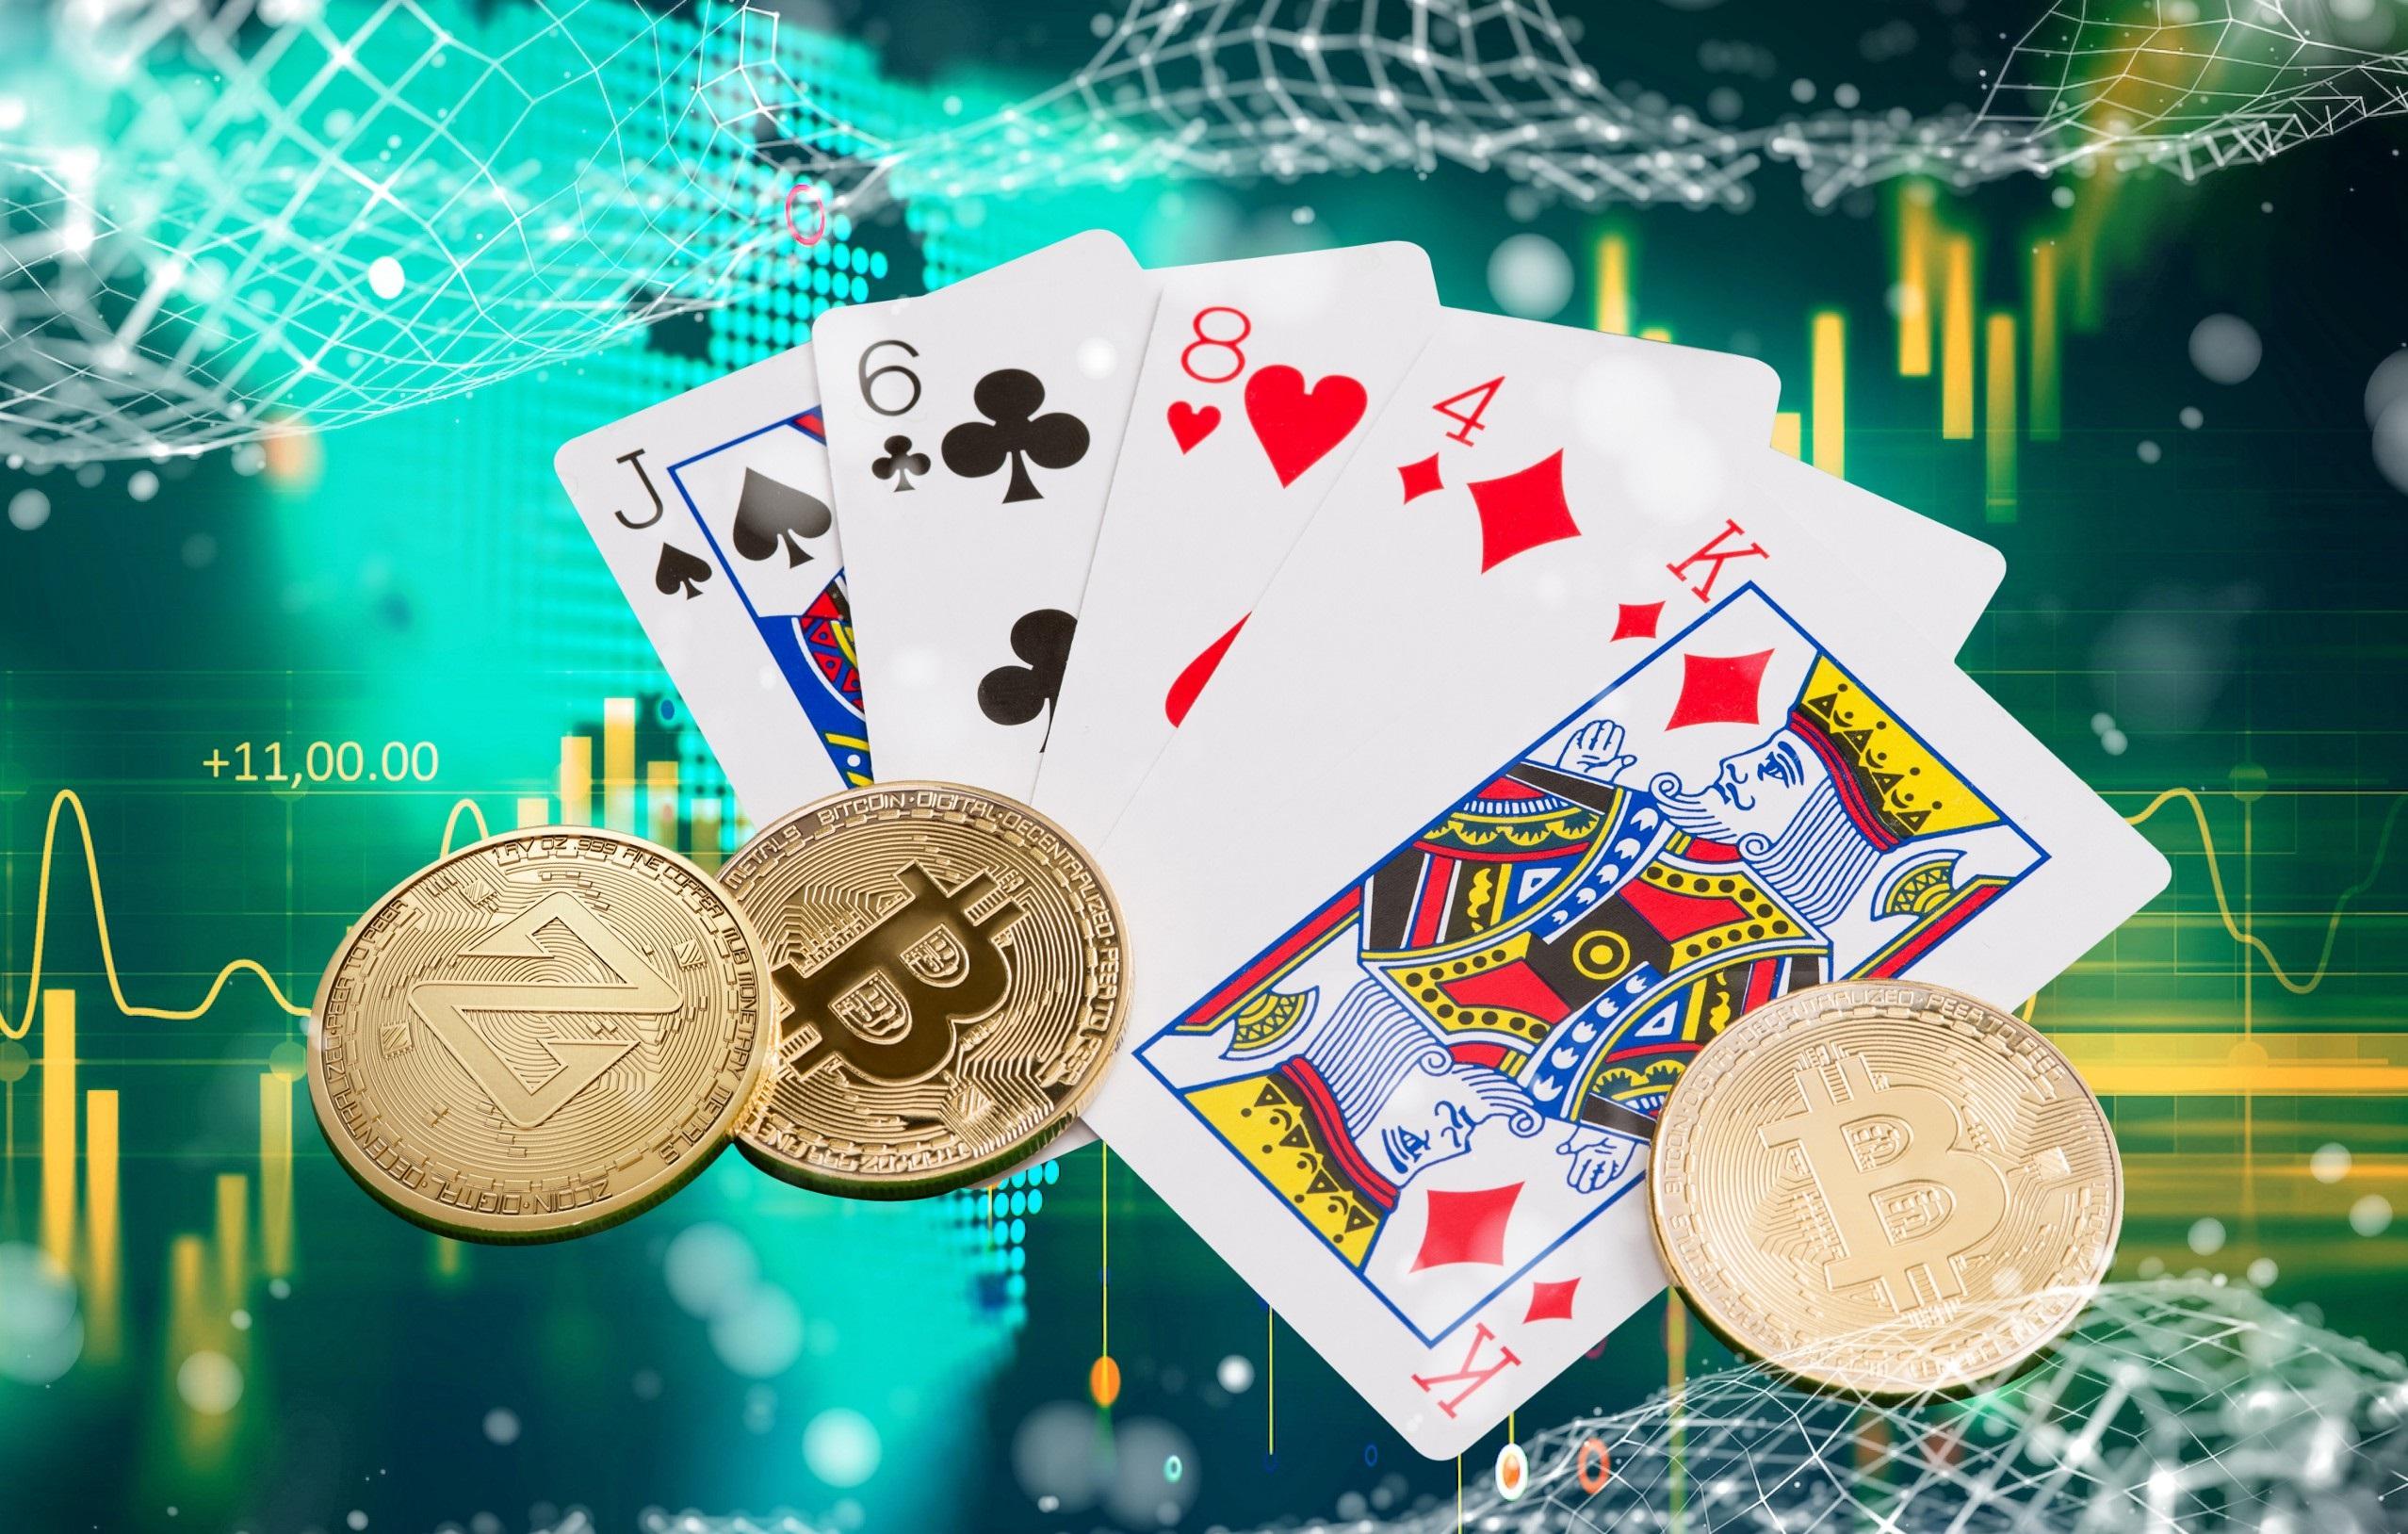 Create 12 permanent DA 58-30 PBN backlinks Casino,  Gambling,  Poker,  Judi Related websites